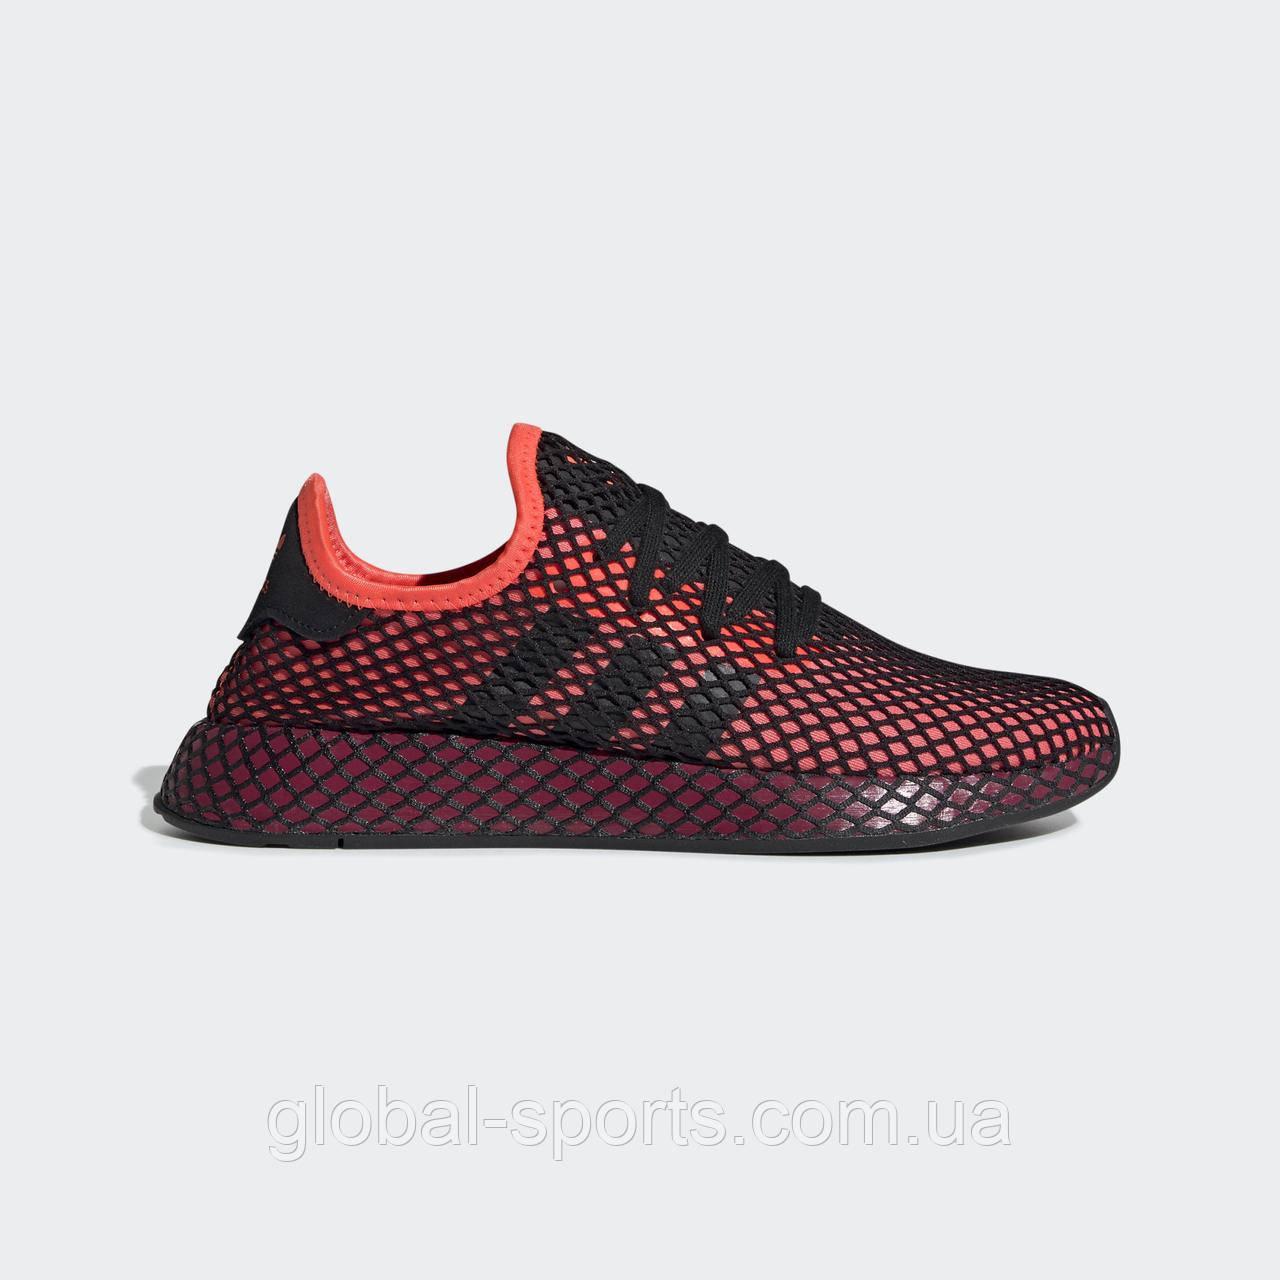 Кроссовки Adidas Deerupt Runner(Артикул:EE5661)